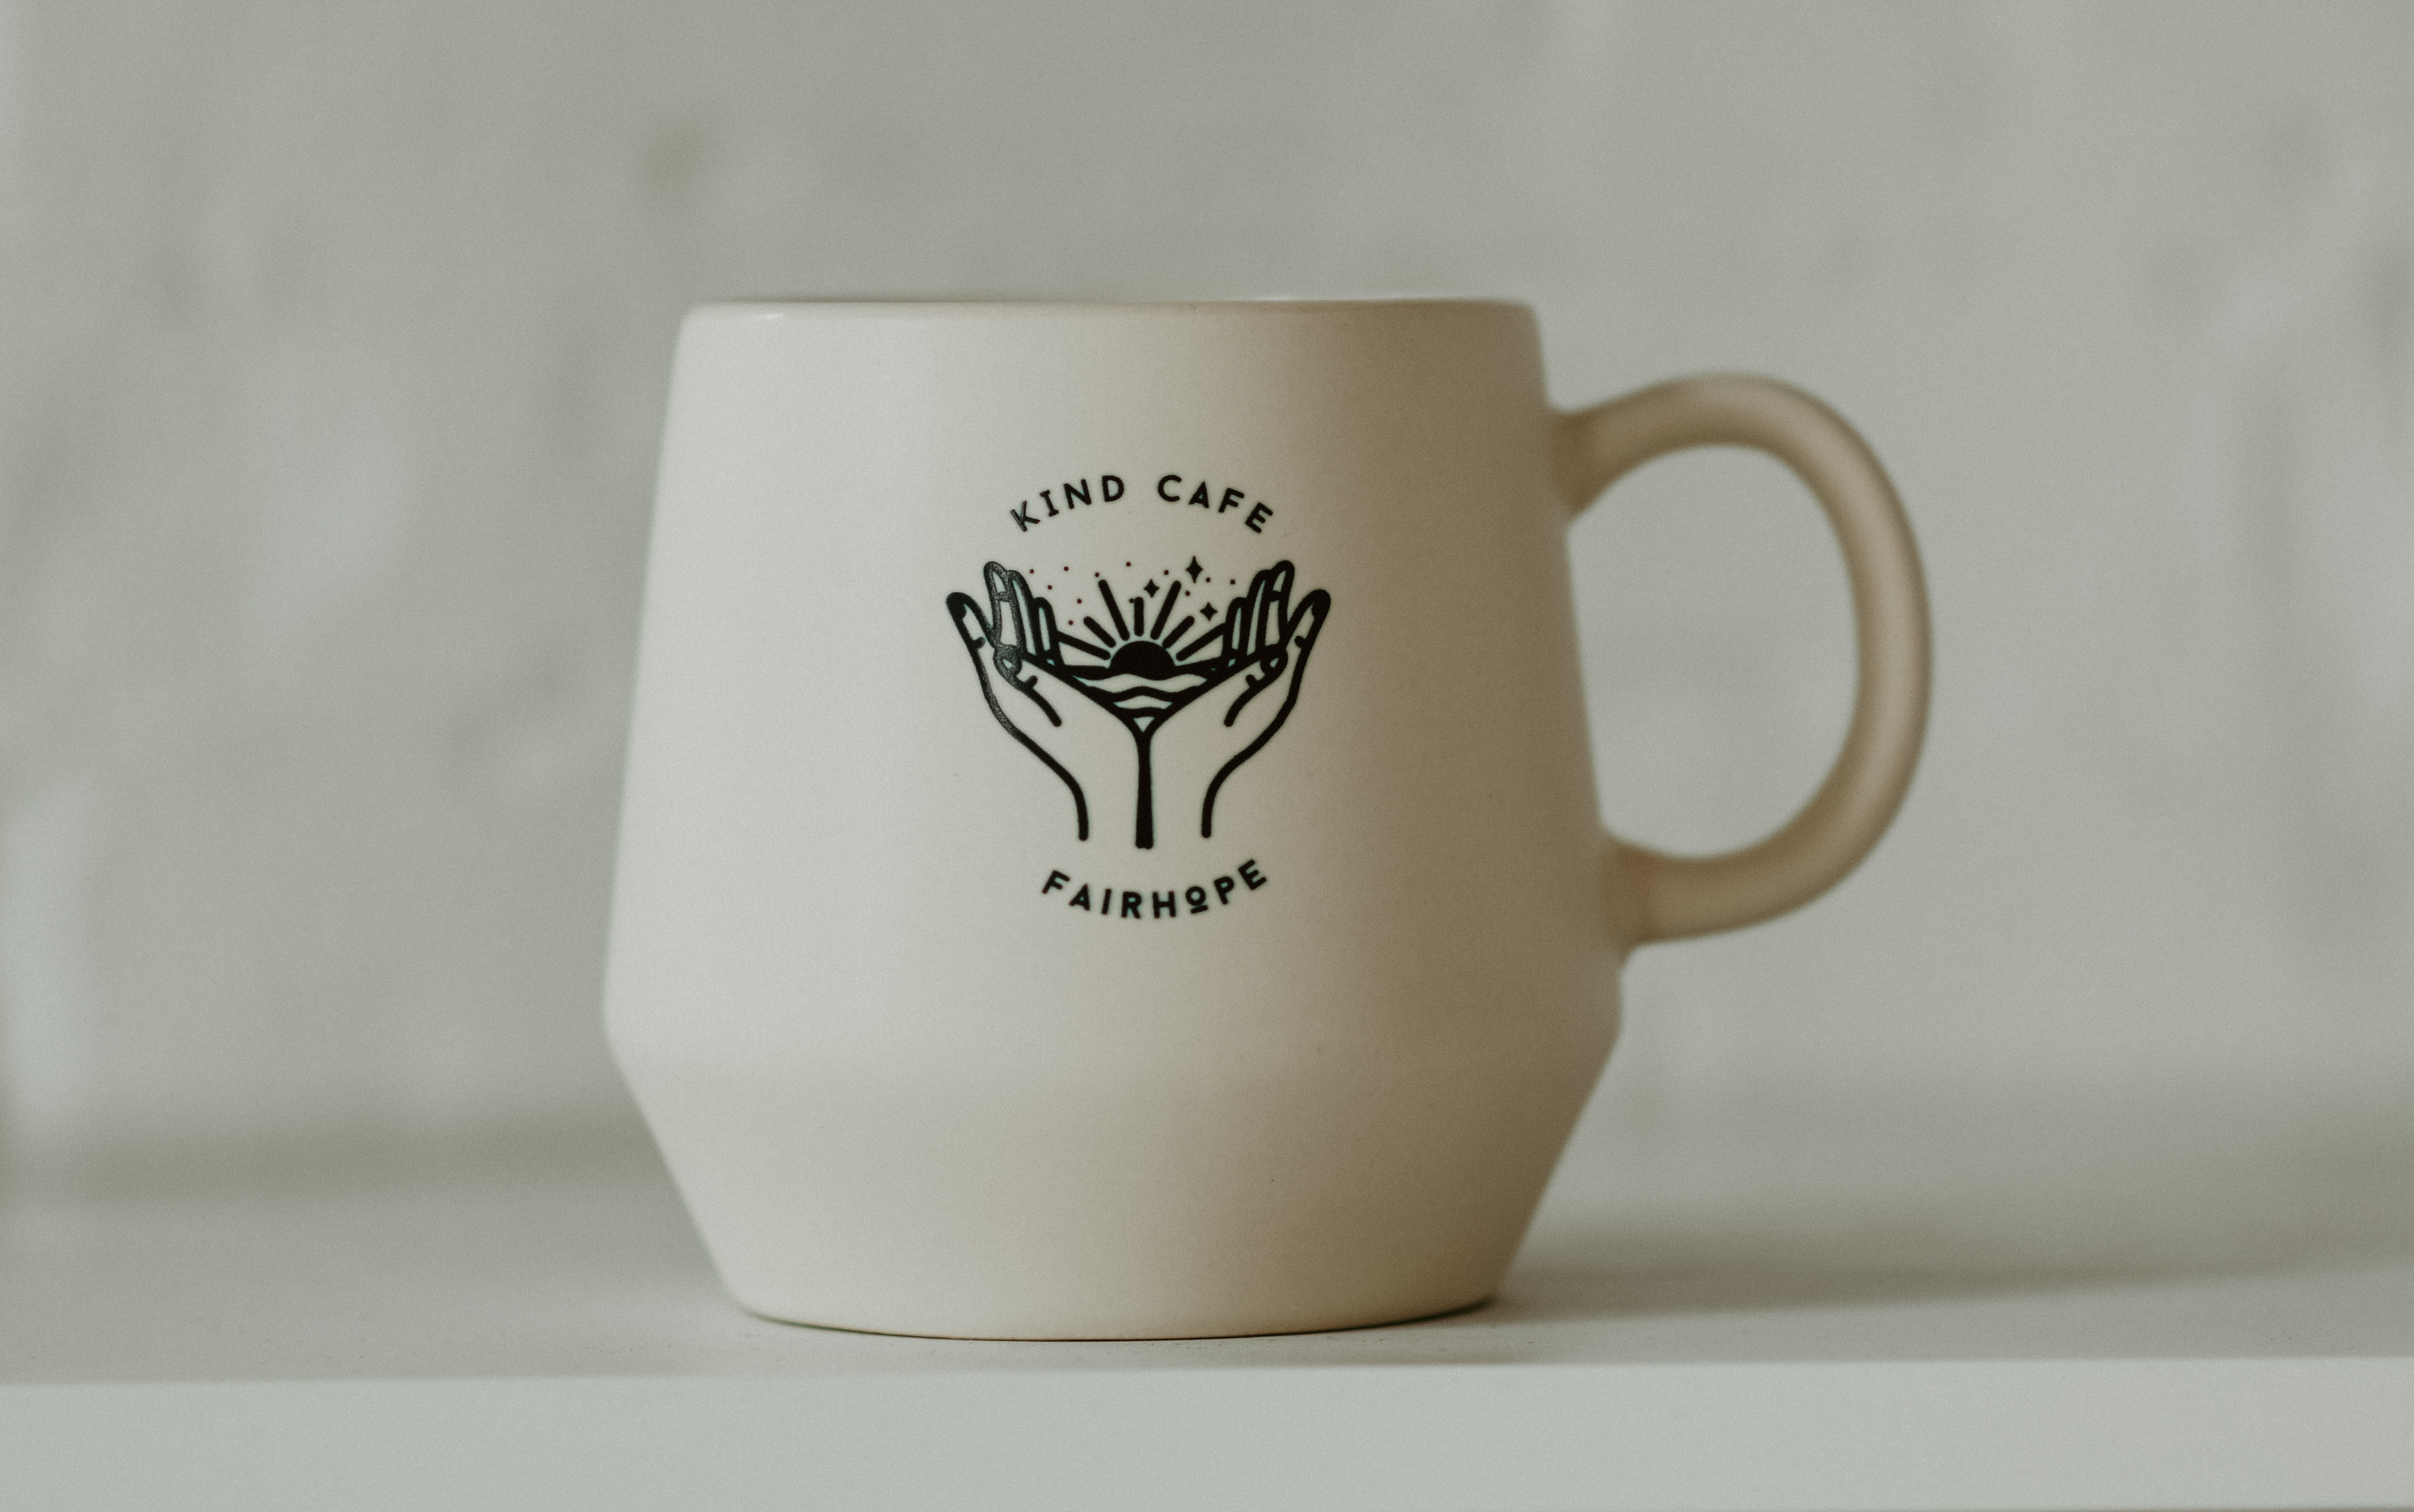 Kind Cafe Mug